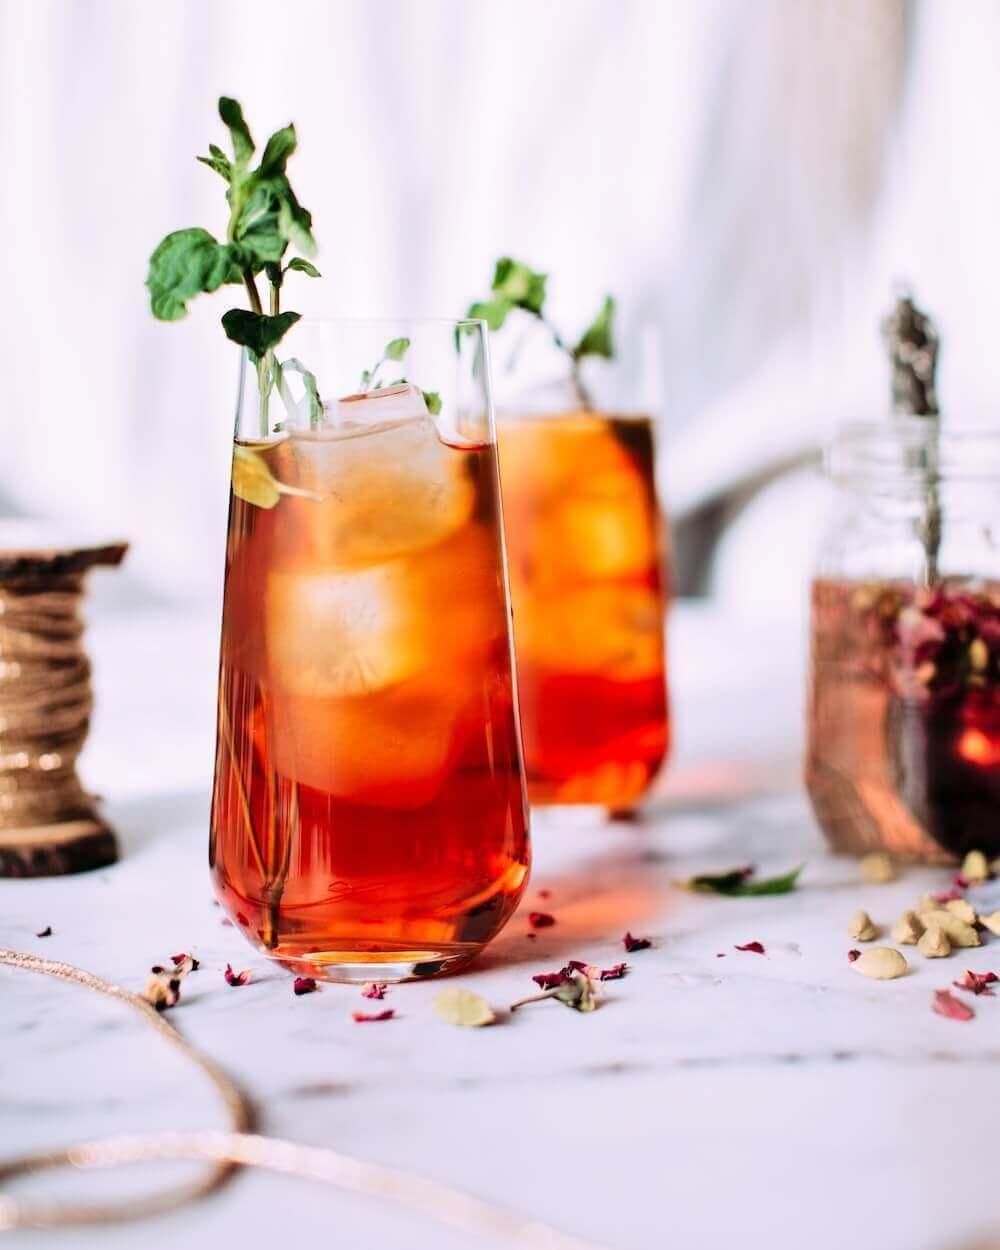 AYA-Farmery-ice-tea-homemade